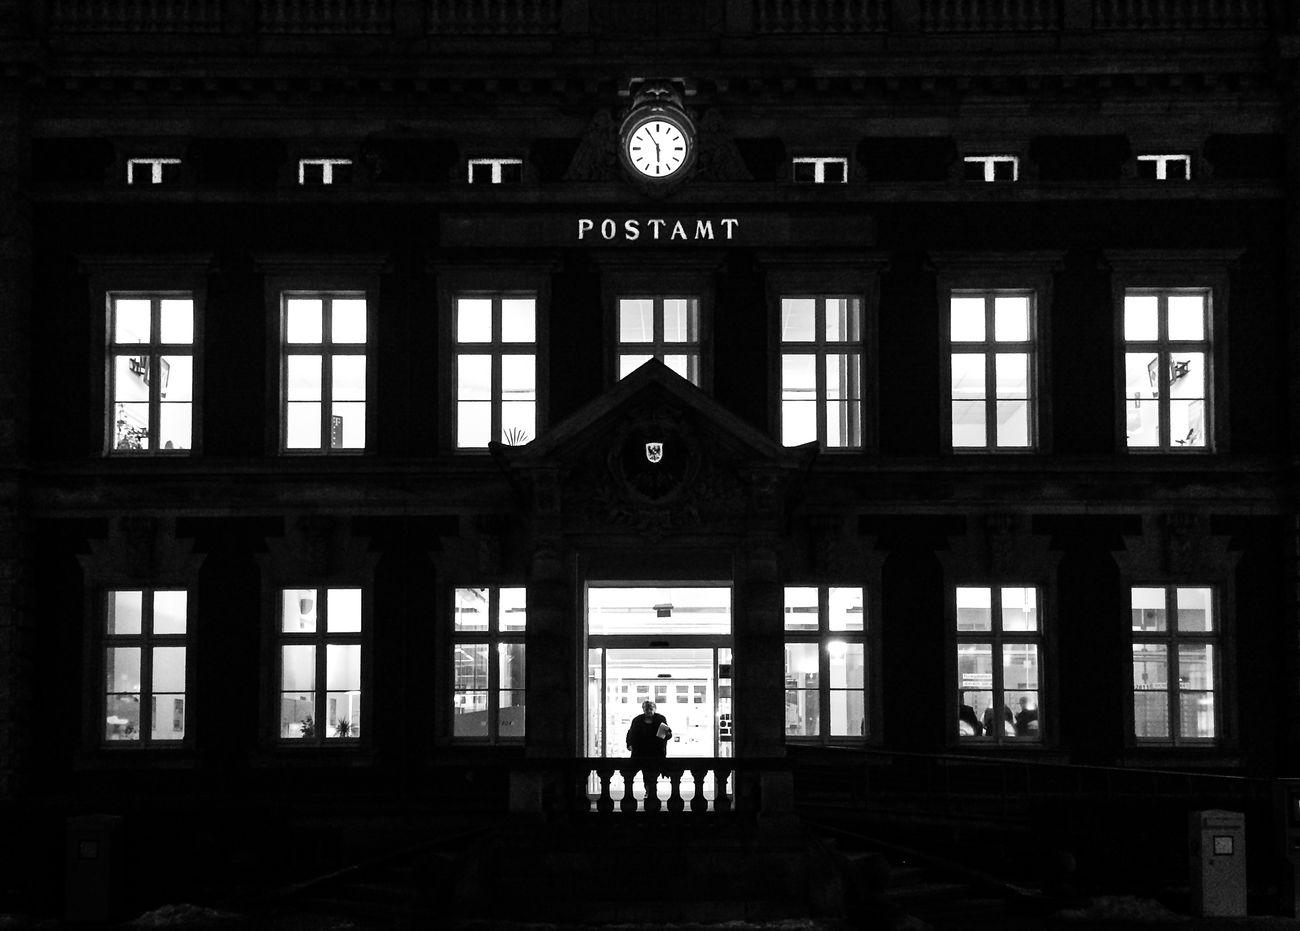 1755 Location: Postplatz Black & White Black And White Blackandwhite EyeEm Best Shots - Black + White Facade Building Monochrome Night Postoffice